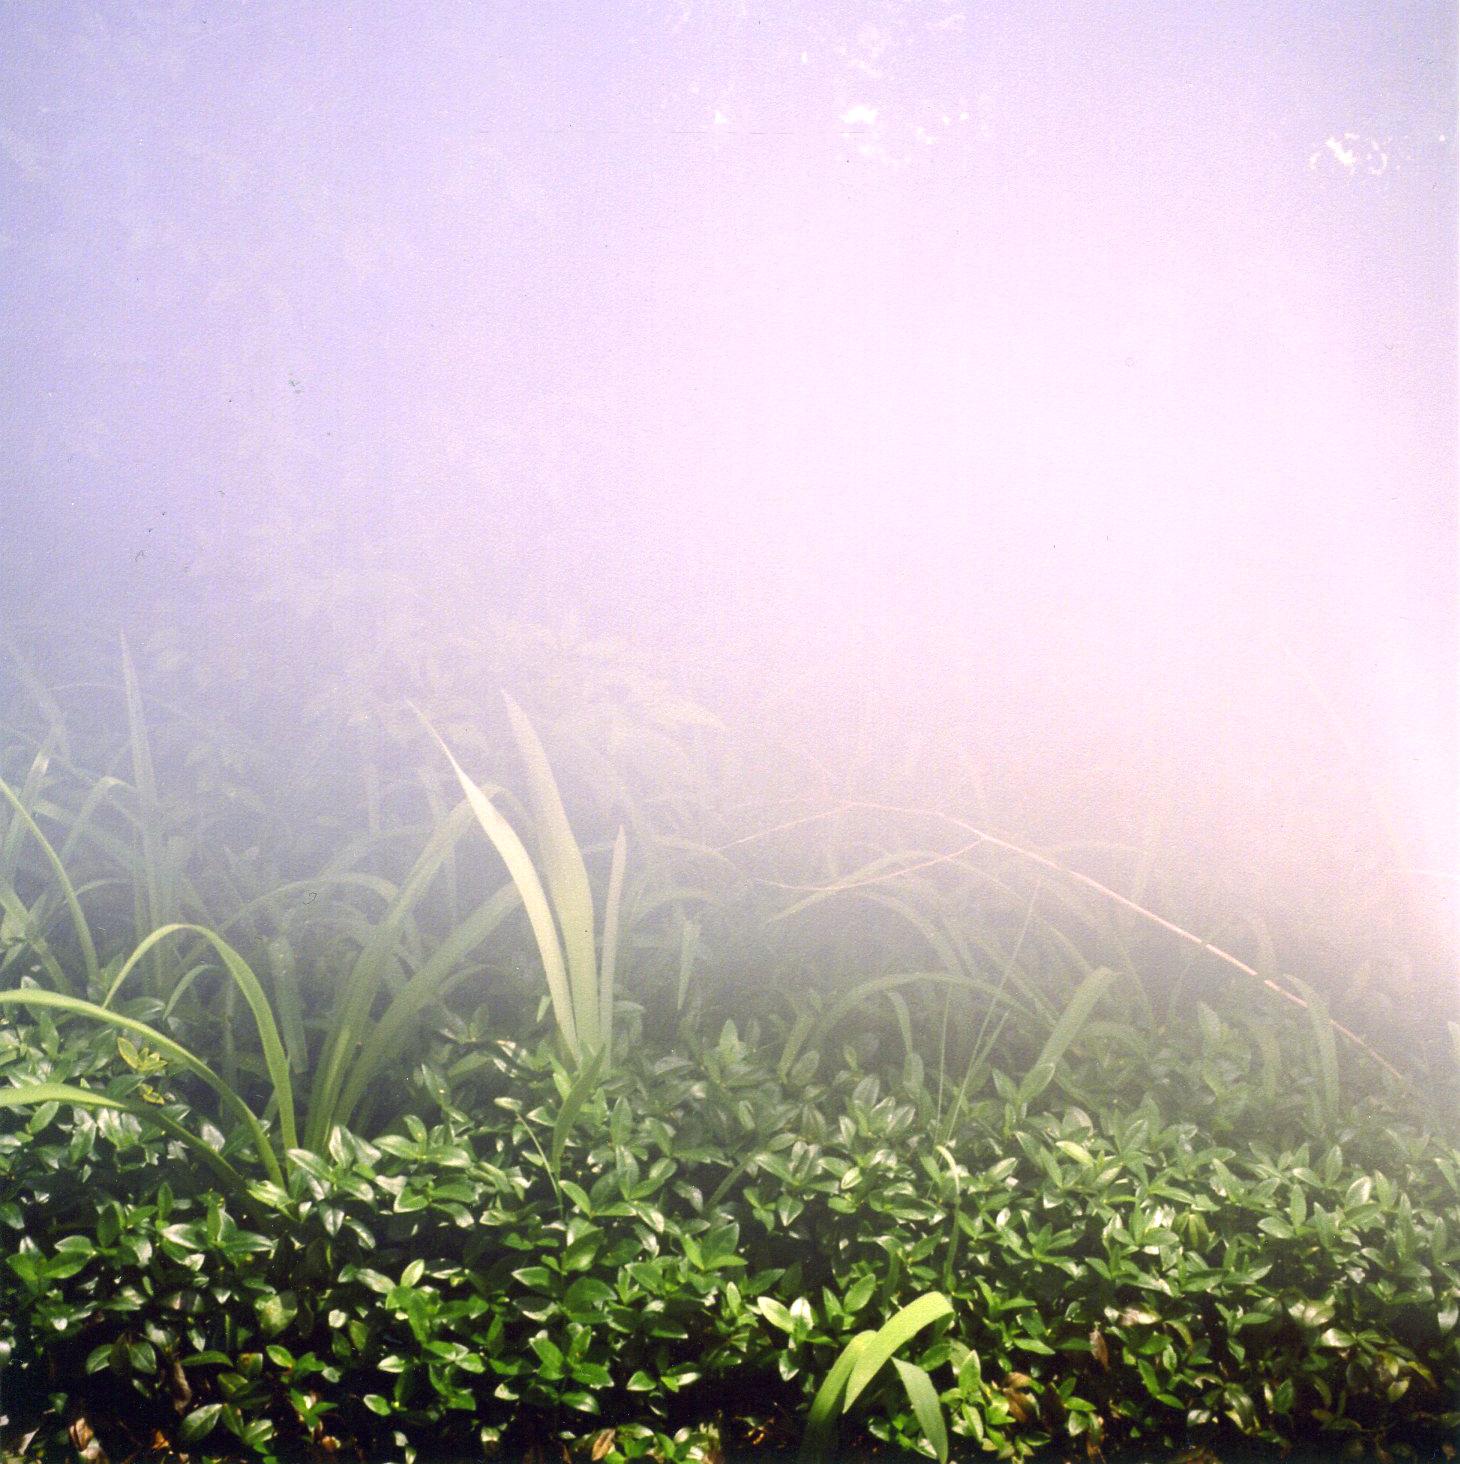 Cloud Grass (Good People, Bad Behavior)